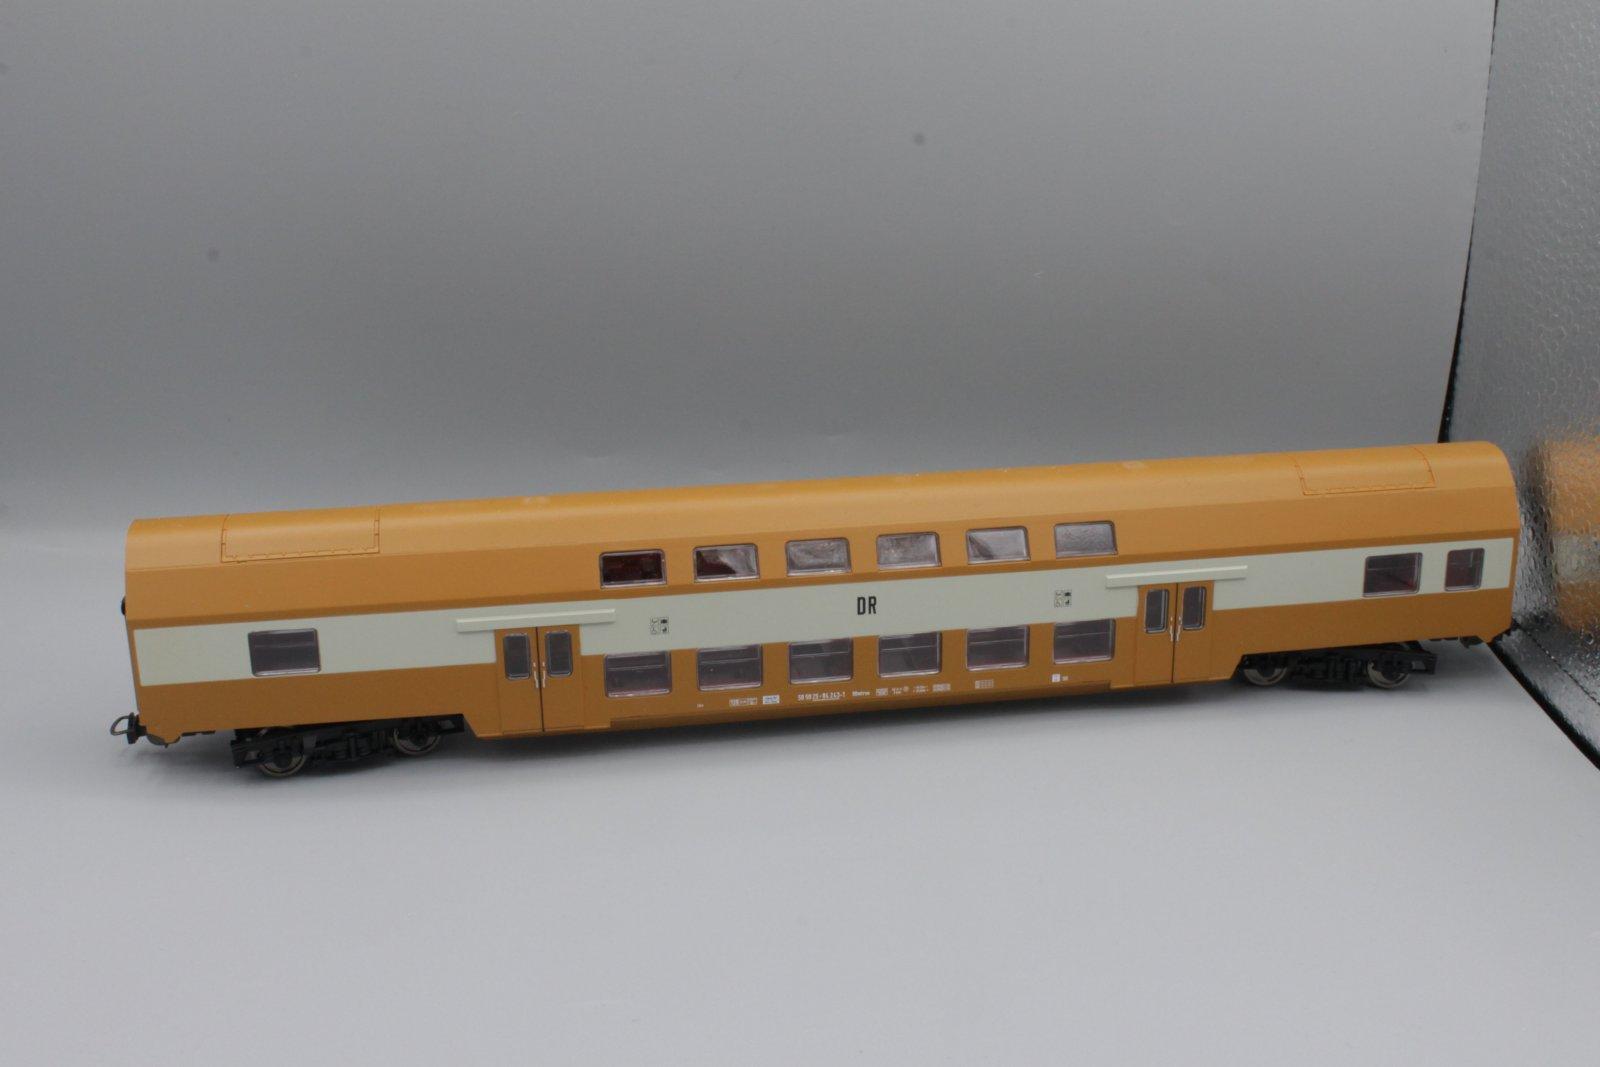 Piko H0 2. Kl. Doppelstockwagen DR sandgelb DBmtrue DR Neuware wie 57622